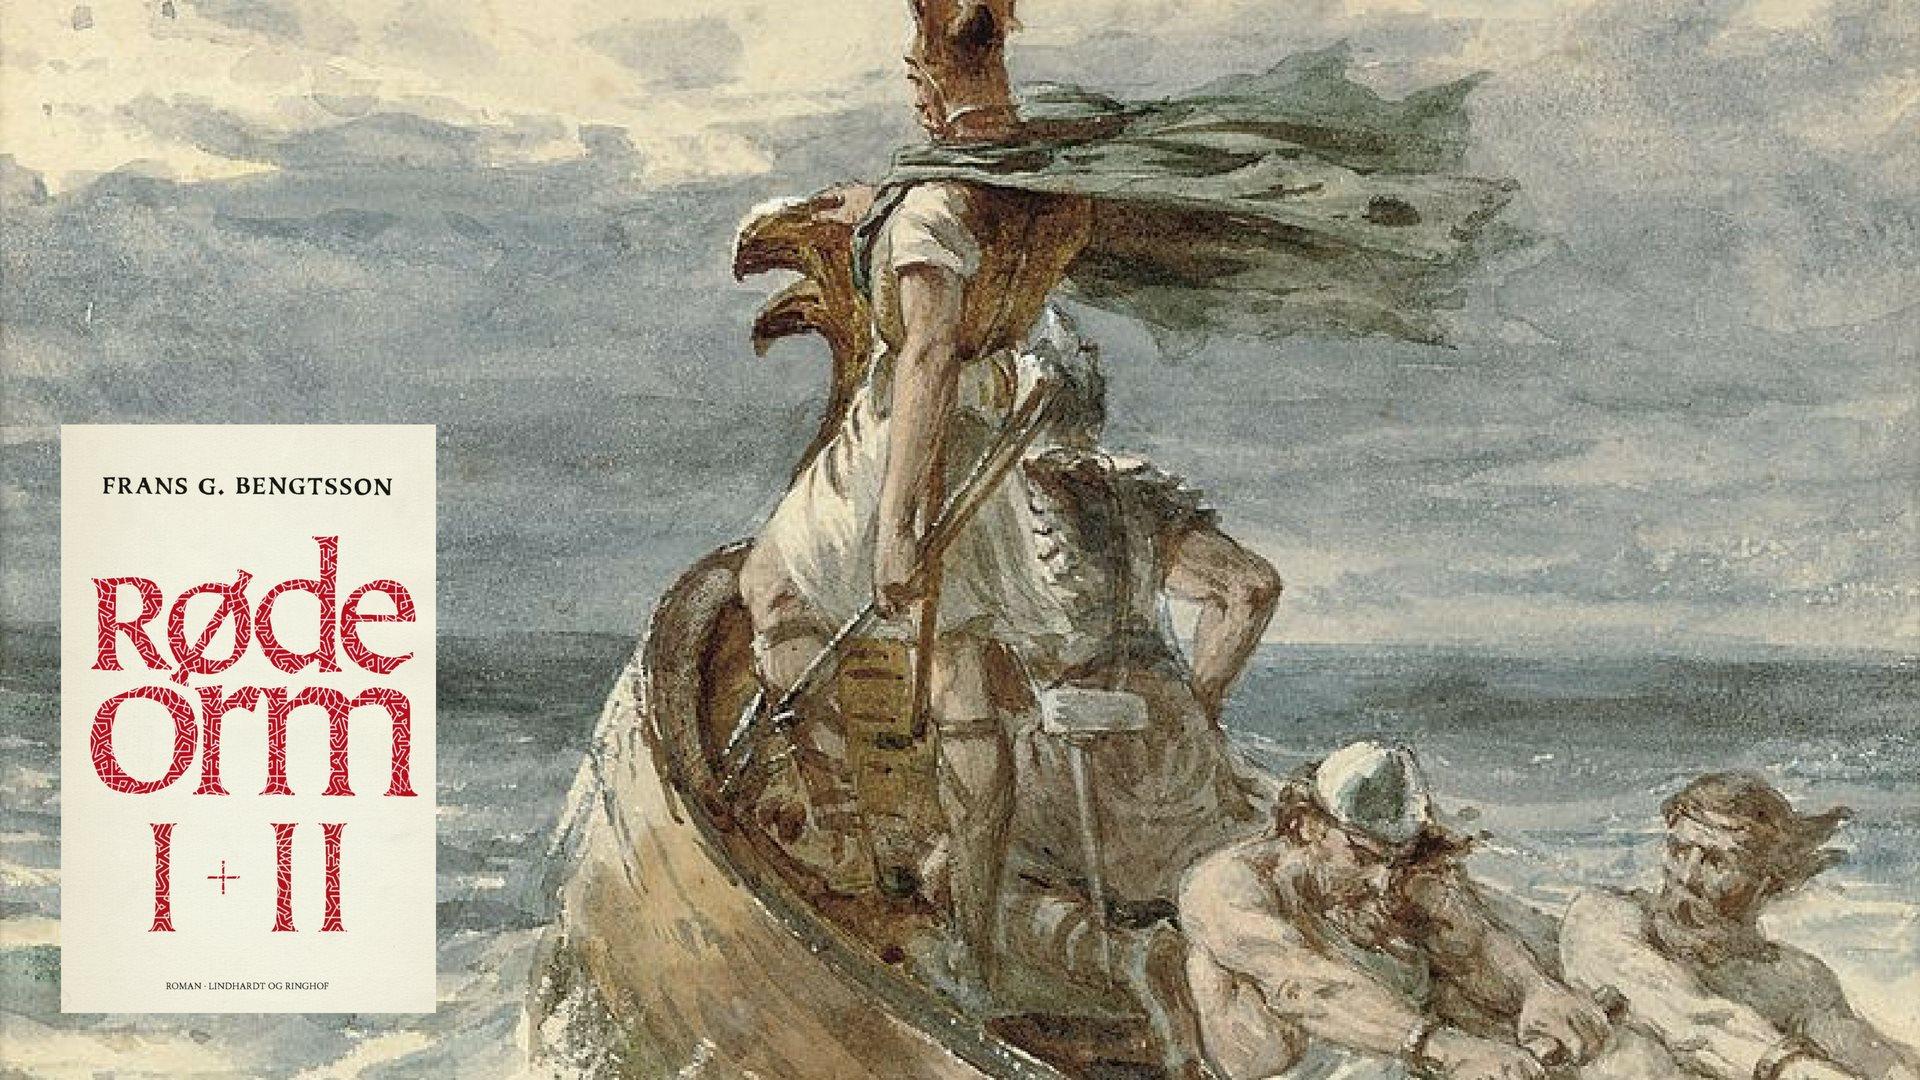 røde orm, frans bengtsson, vikinger, sagaer, moesgaard museum, dyrehaven, det kongelige teater, andreas jebro, teater, vikingeskib